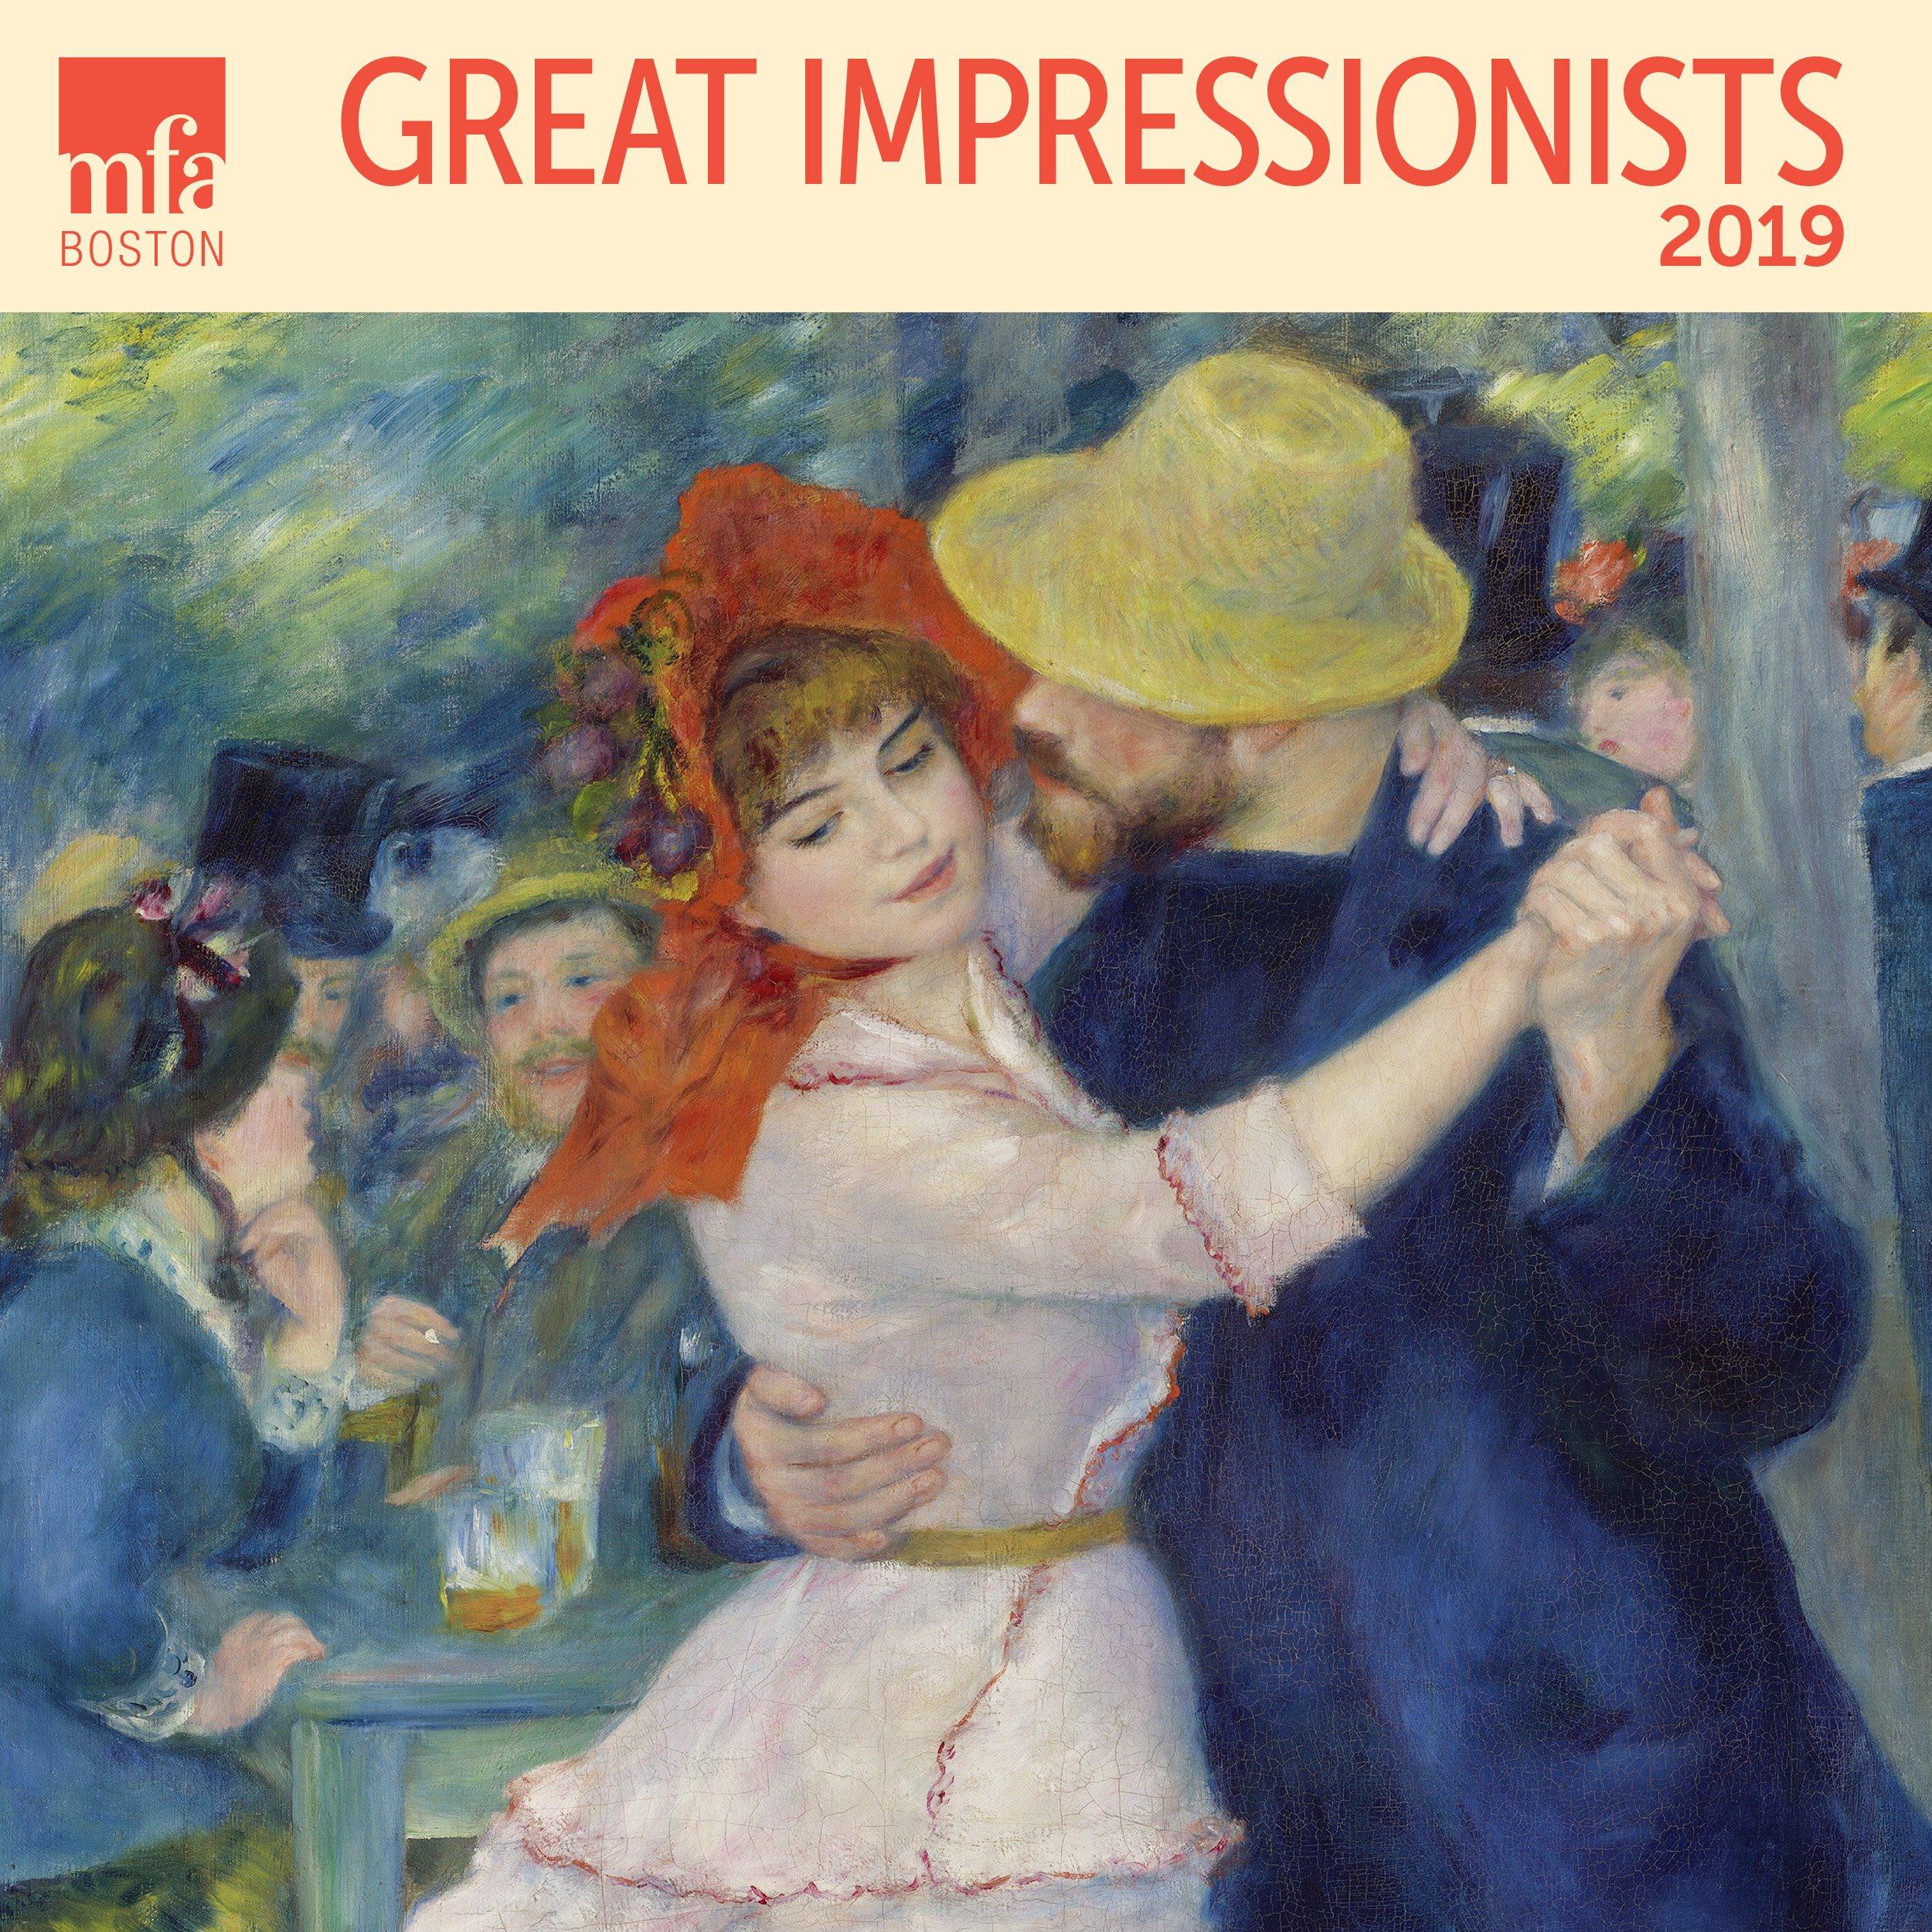 Great Impressionists MFA, Boston Wall Calendar 2019 Monthly January-December 12'' x 12''